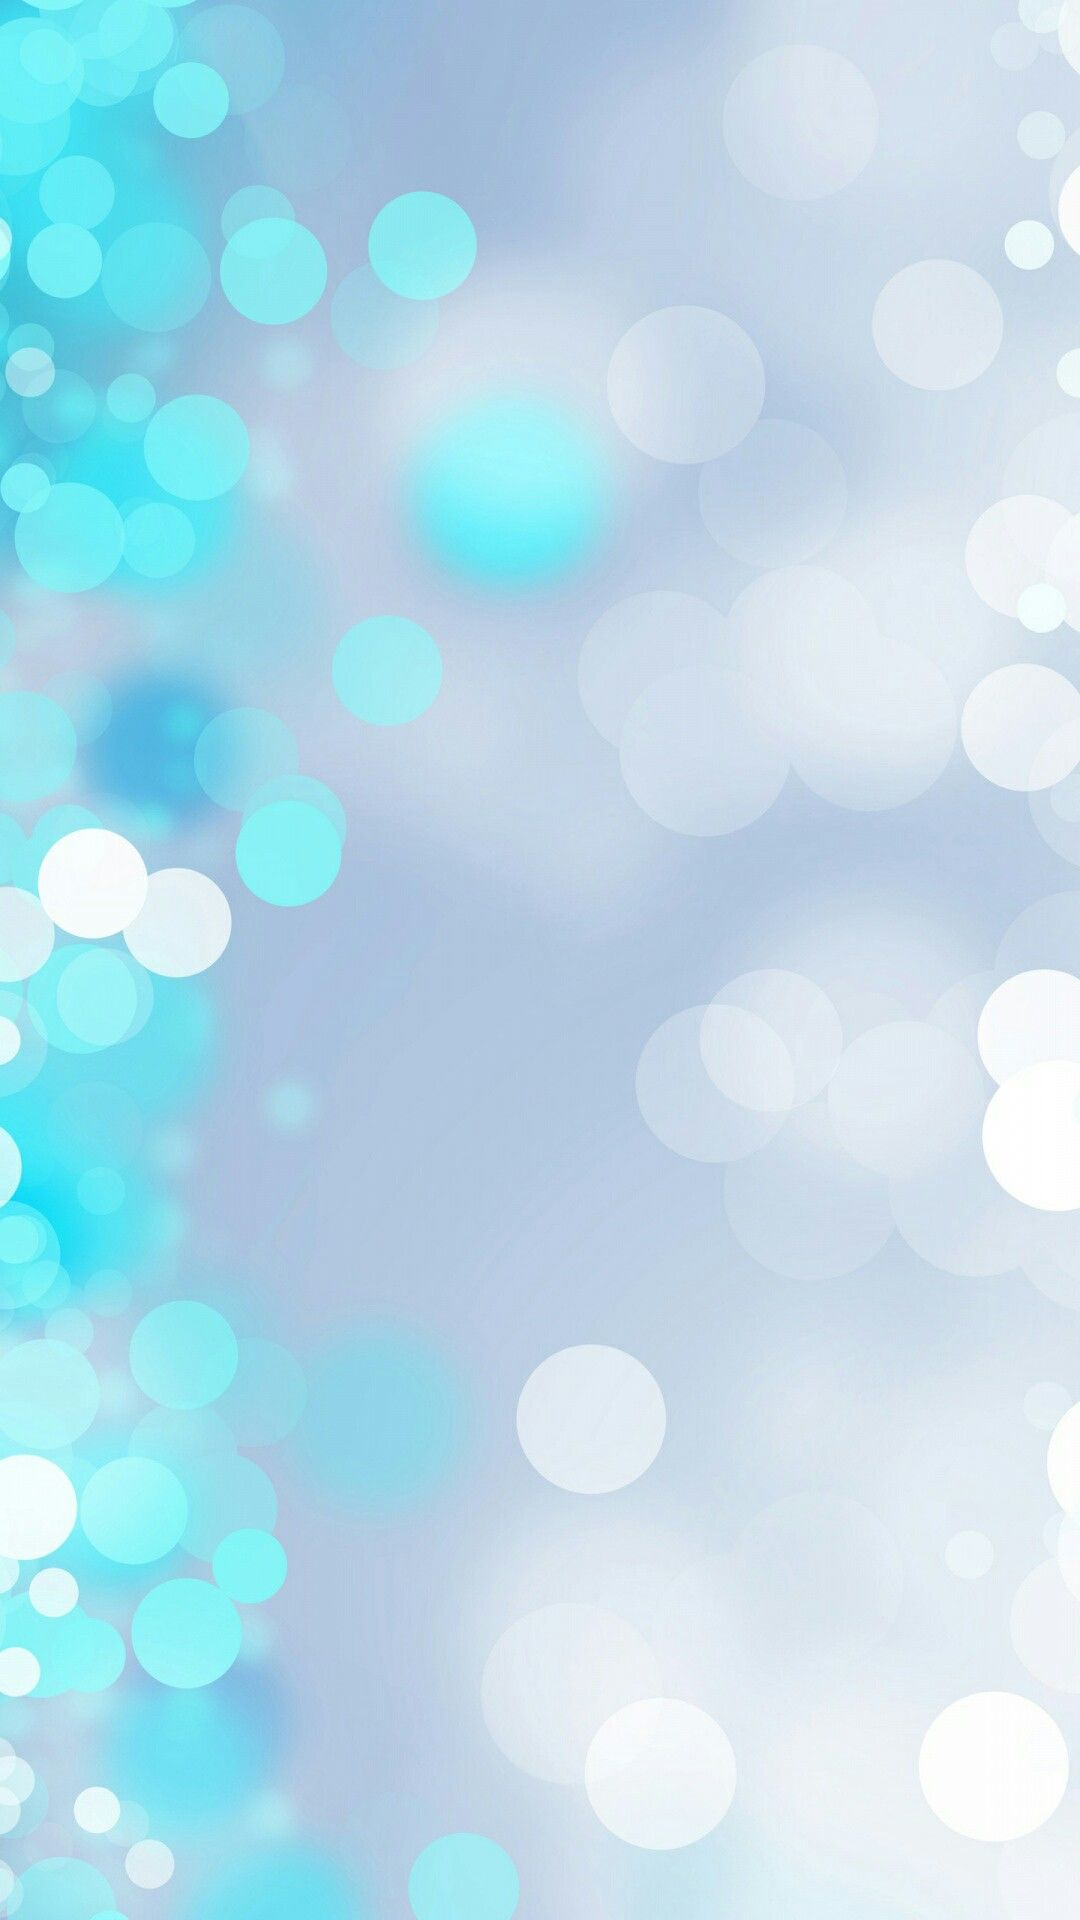 Light Blue Wallpaper Pastel Background Wallpapers Grey Wallpaper Iphone Apple Watch Wallpaper